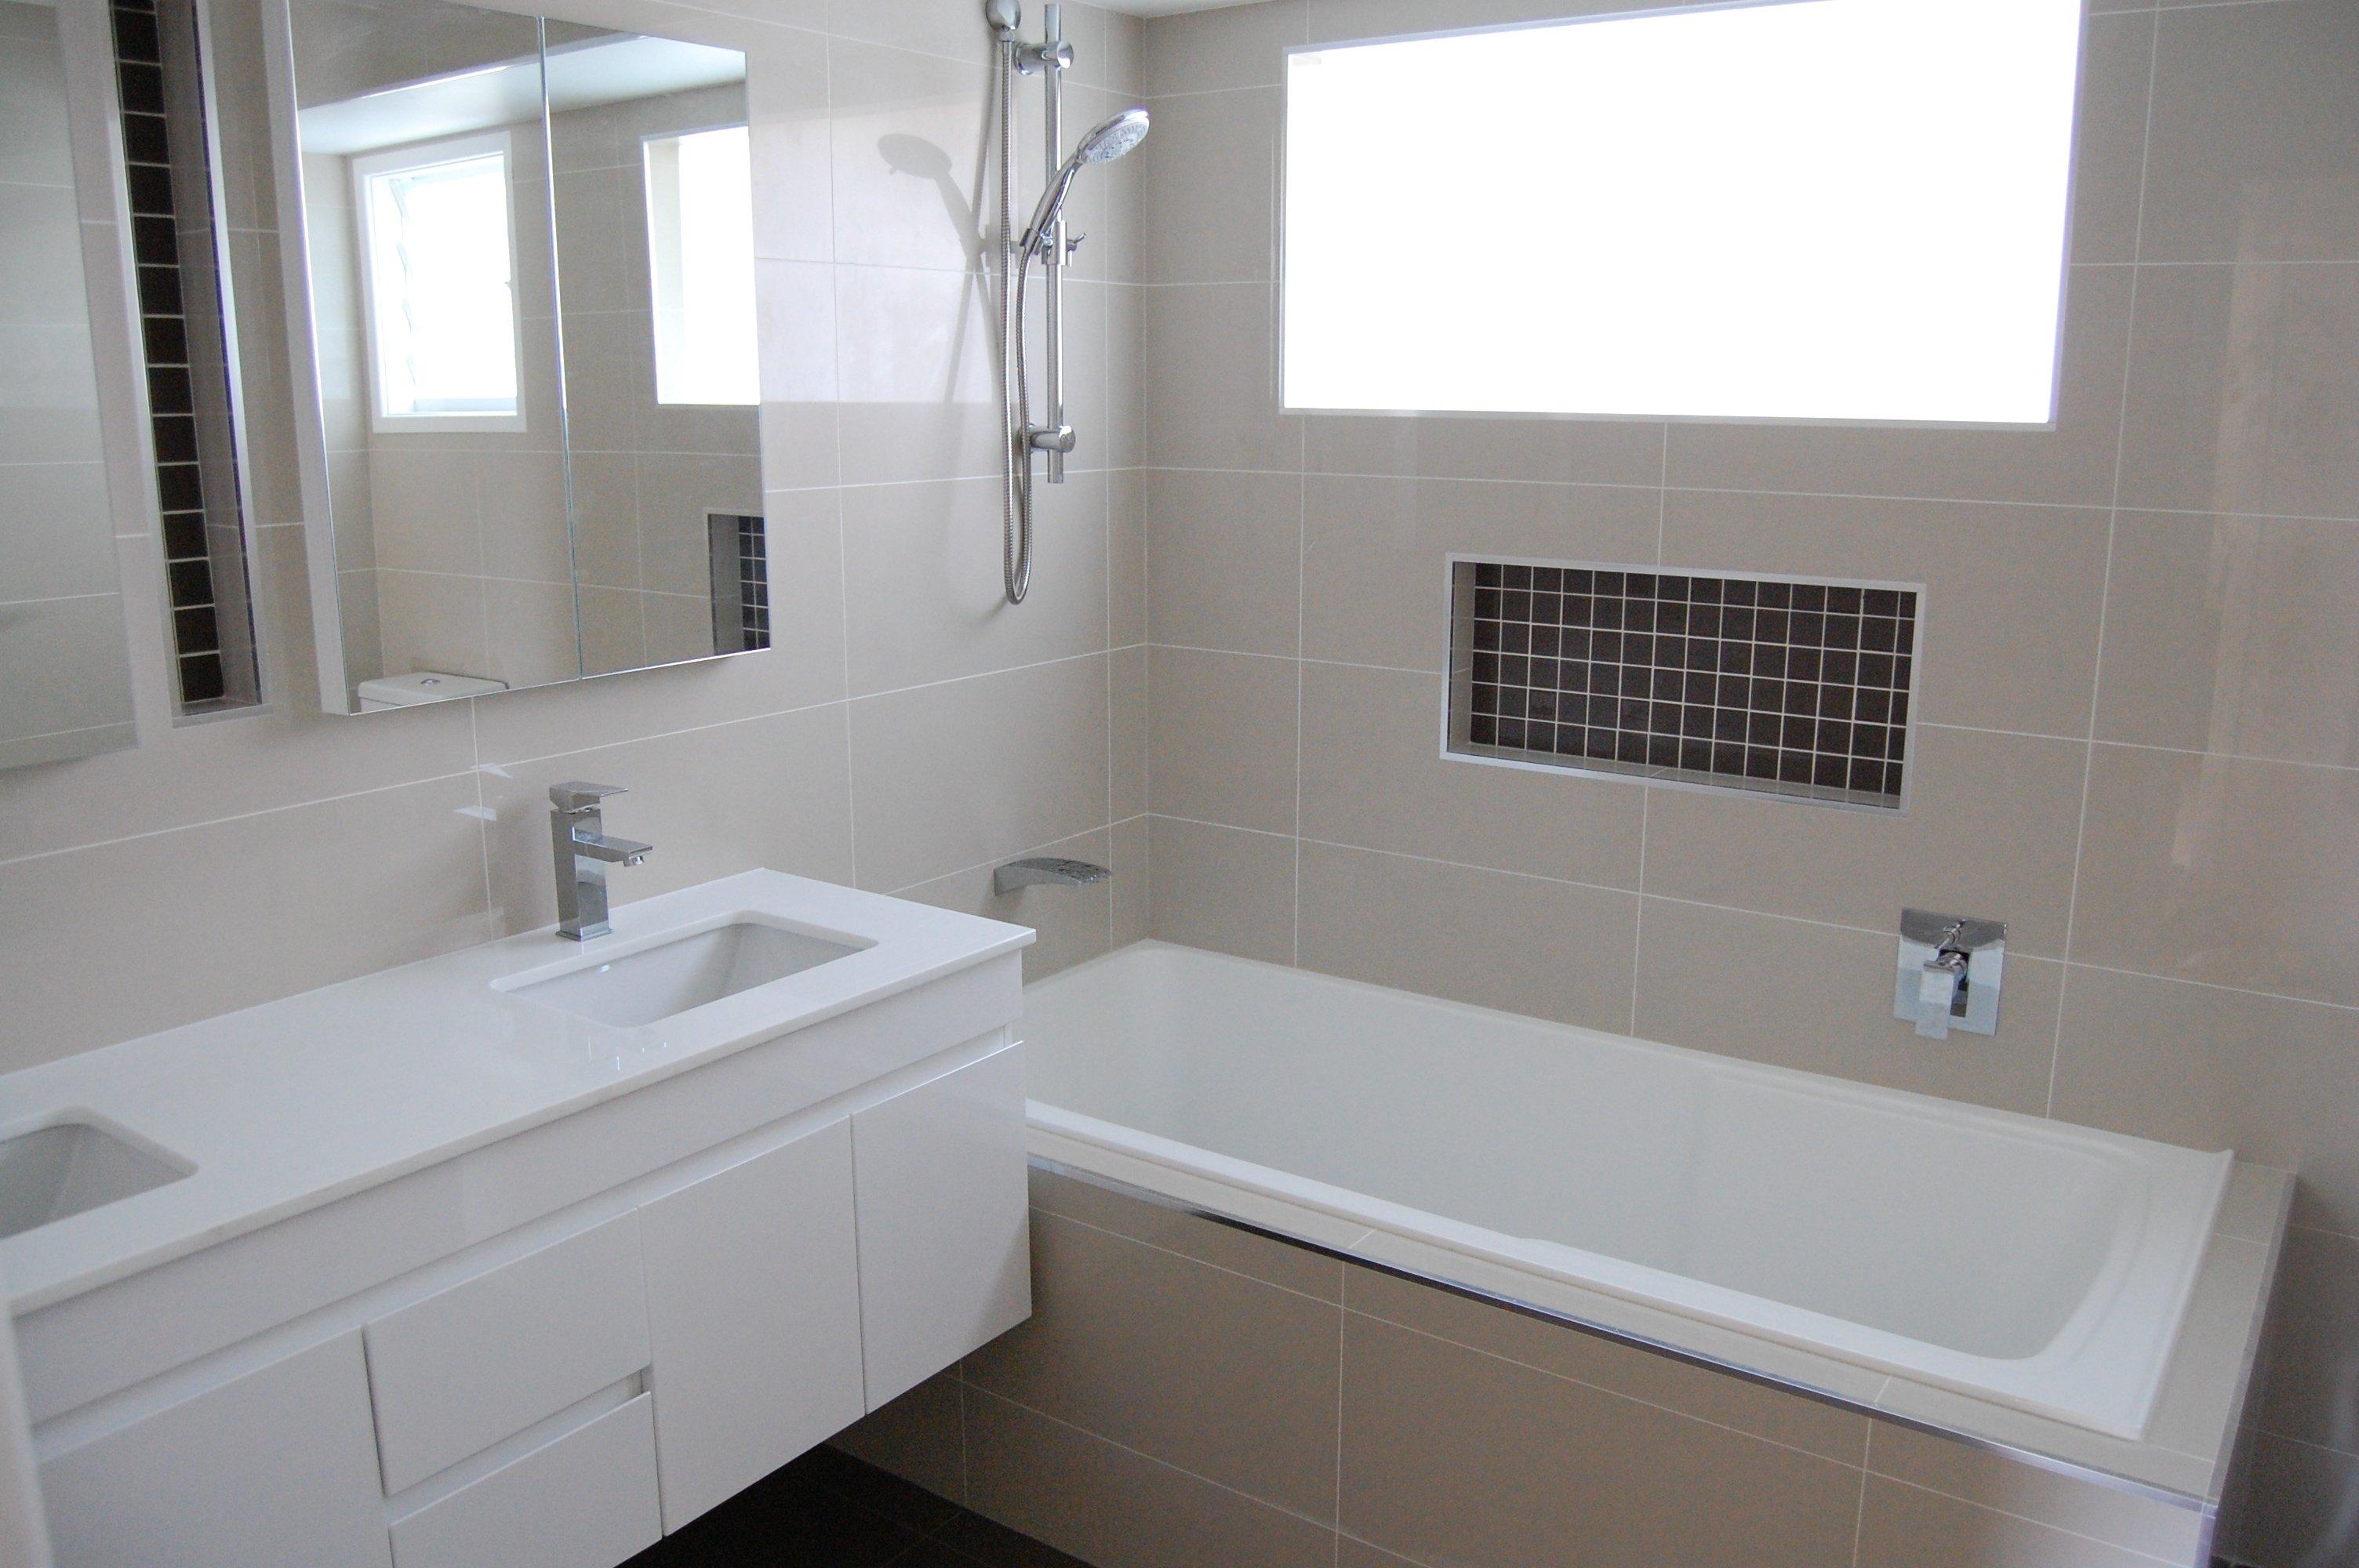 10 Amazing Bathroom Tile Ideas On A Budget cool bathroom ideas on a budget ee116 home interior design beautiful 2020